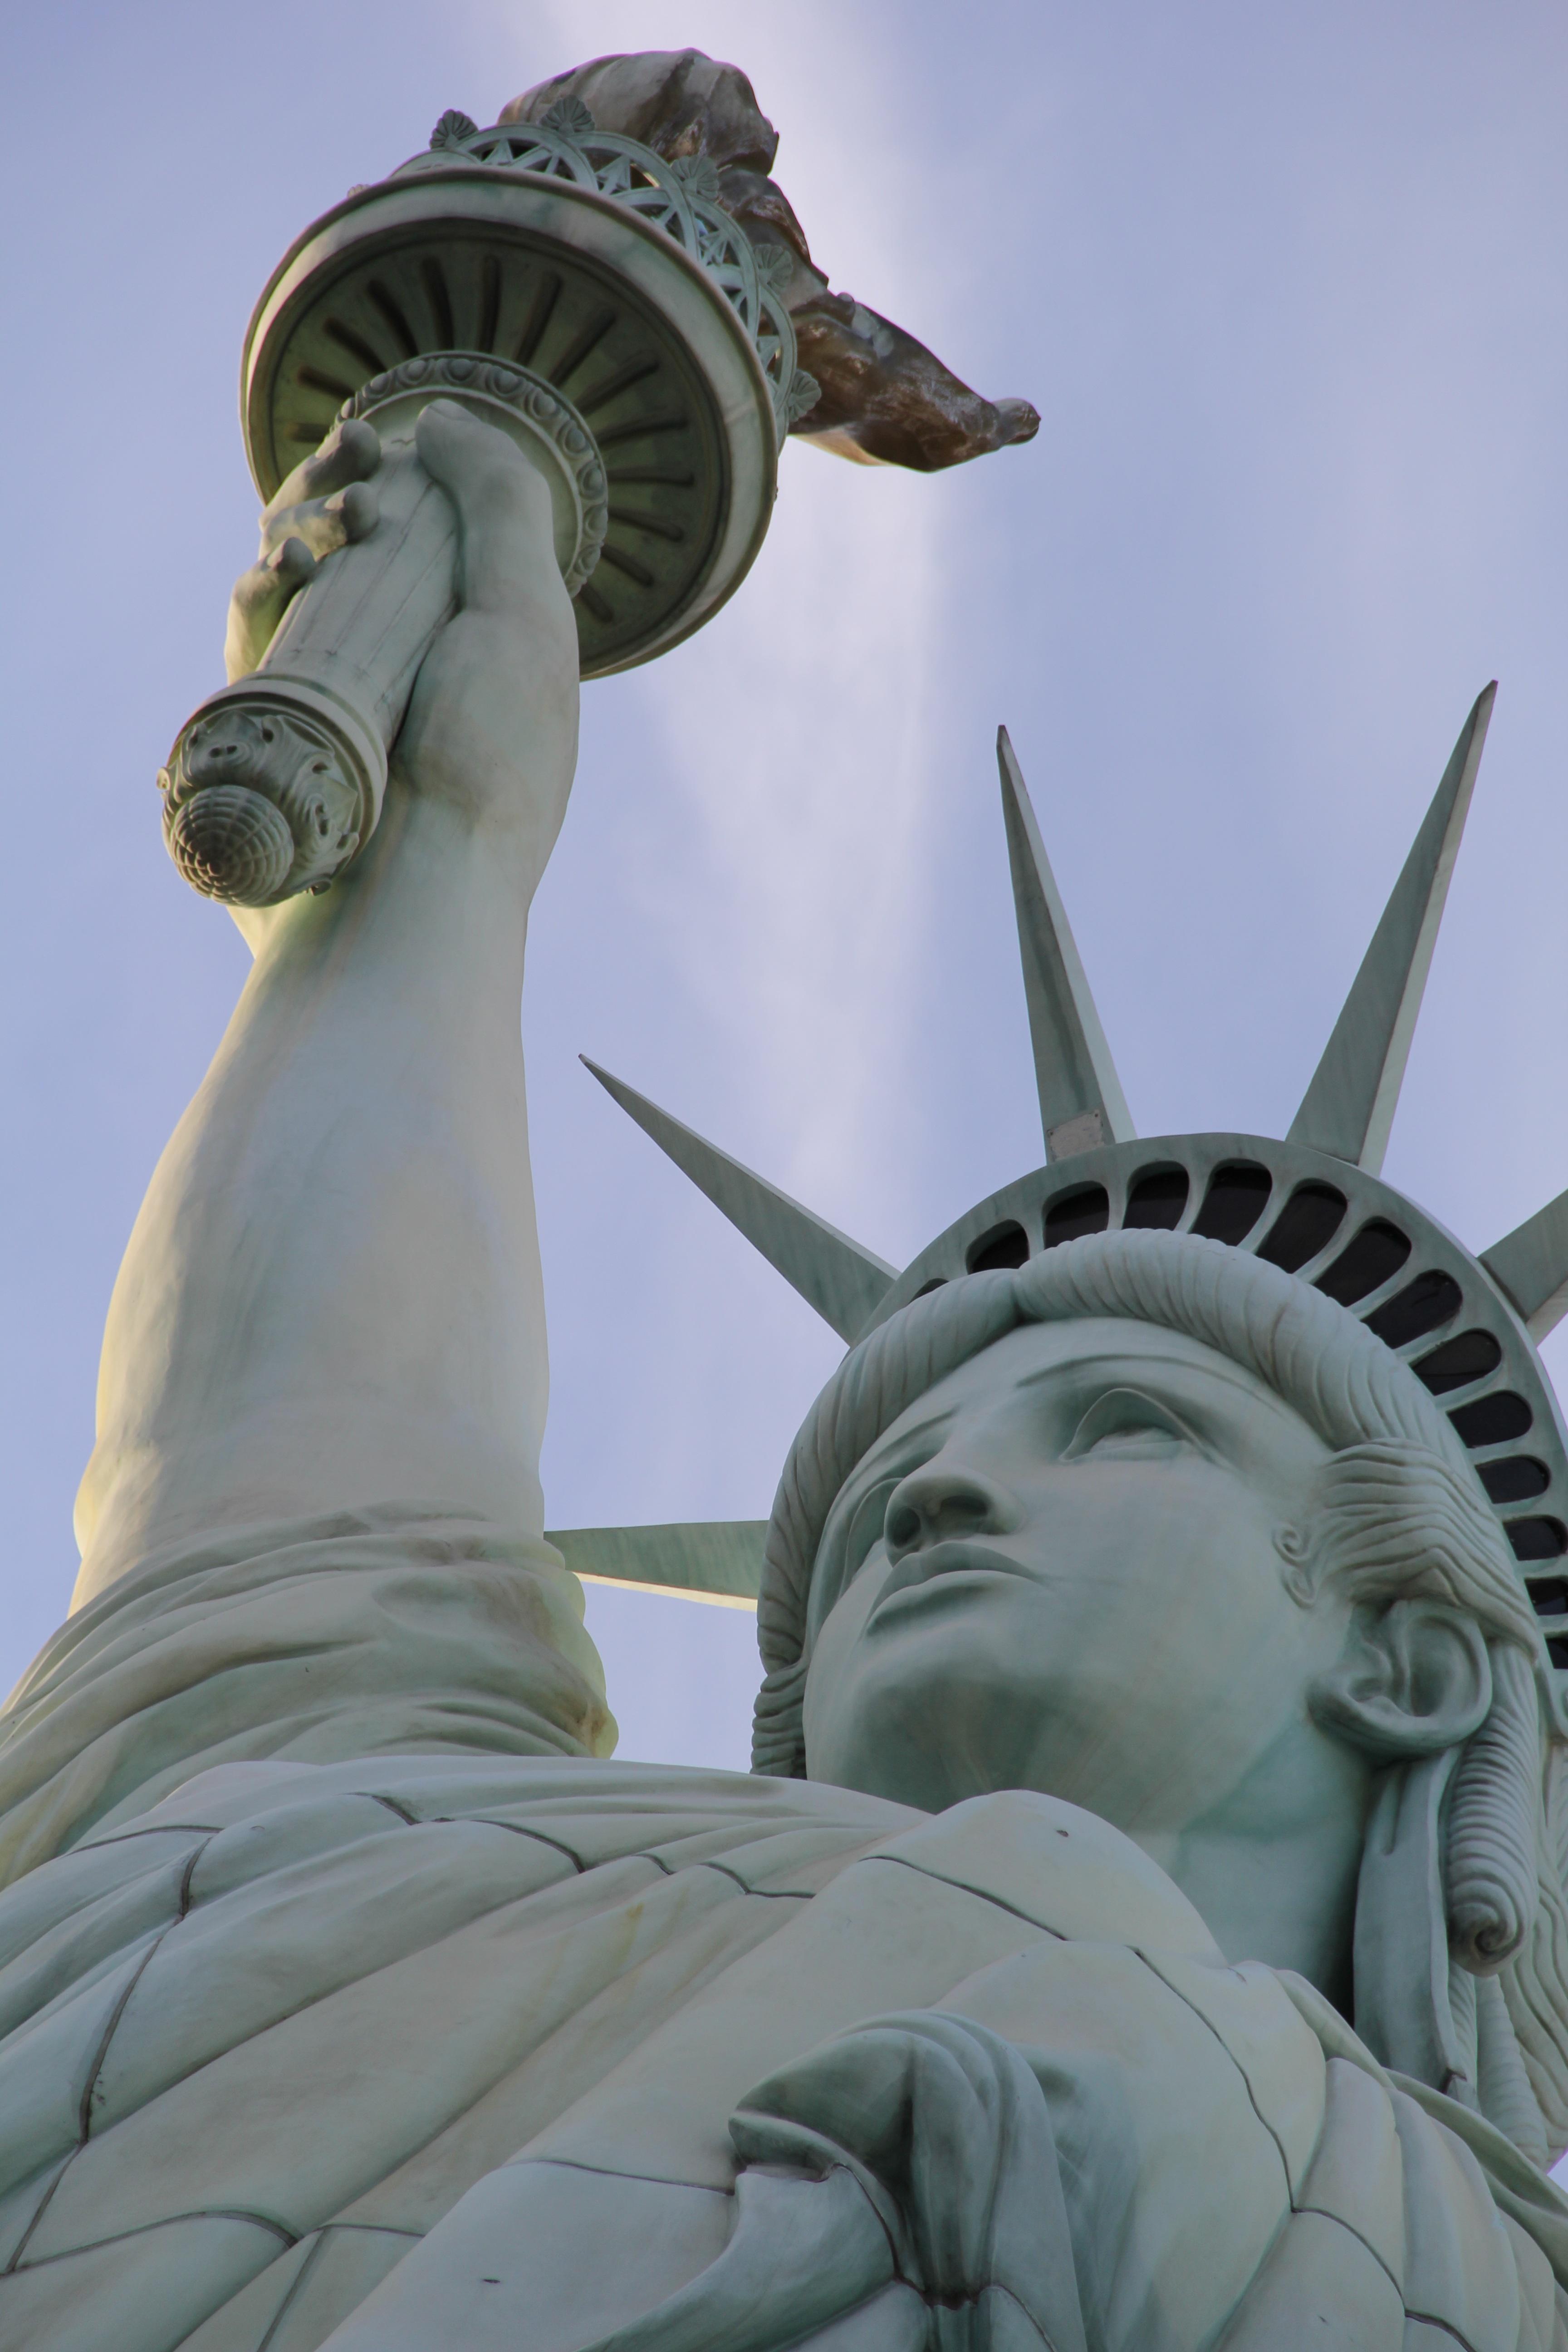 Sculpture Hd Wallpapers Free Stock Photo Of Figure Lady Liberty Landmark